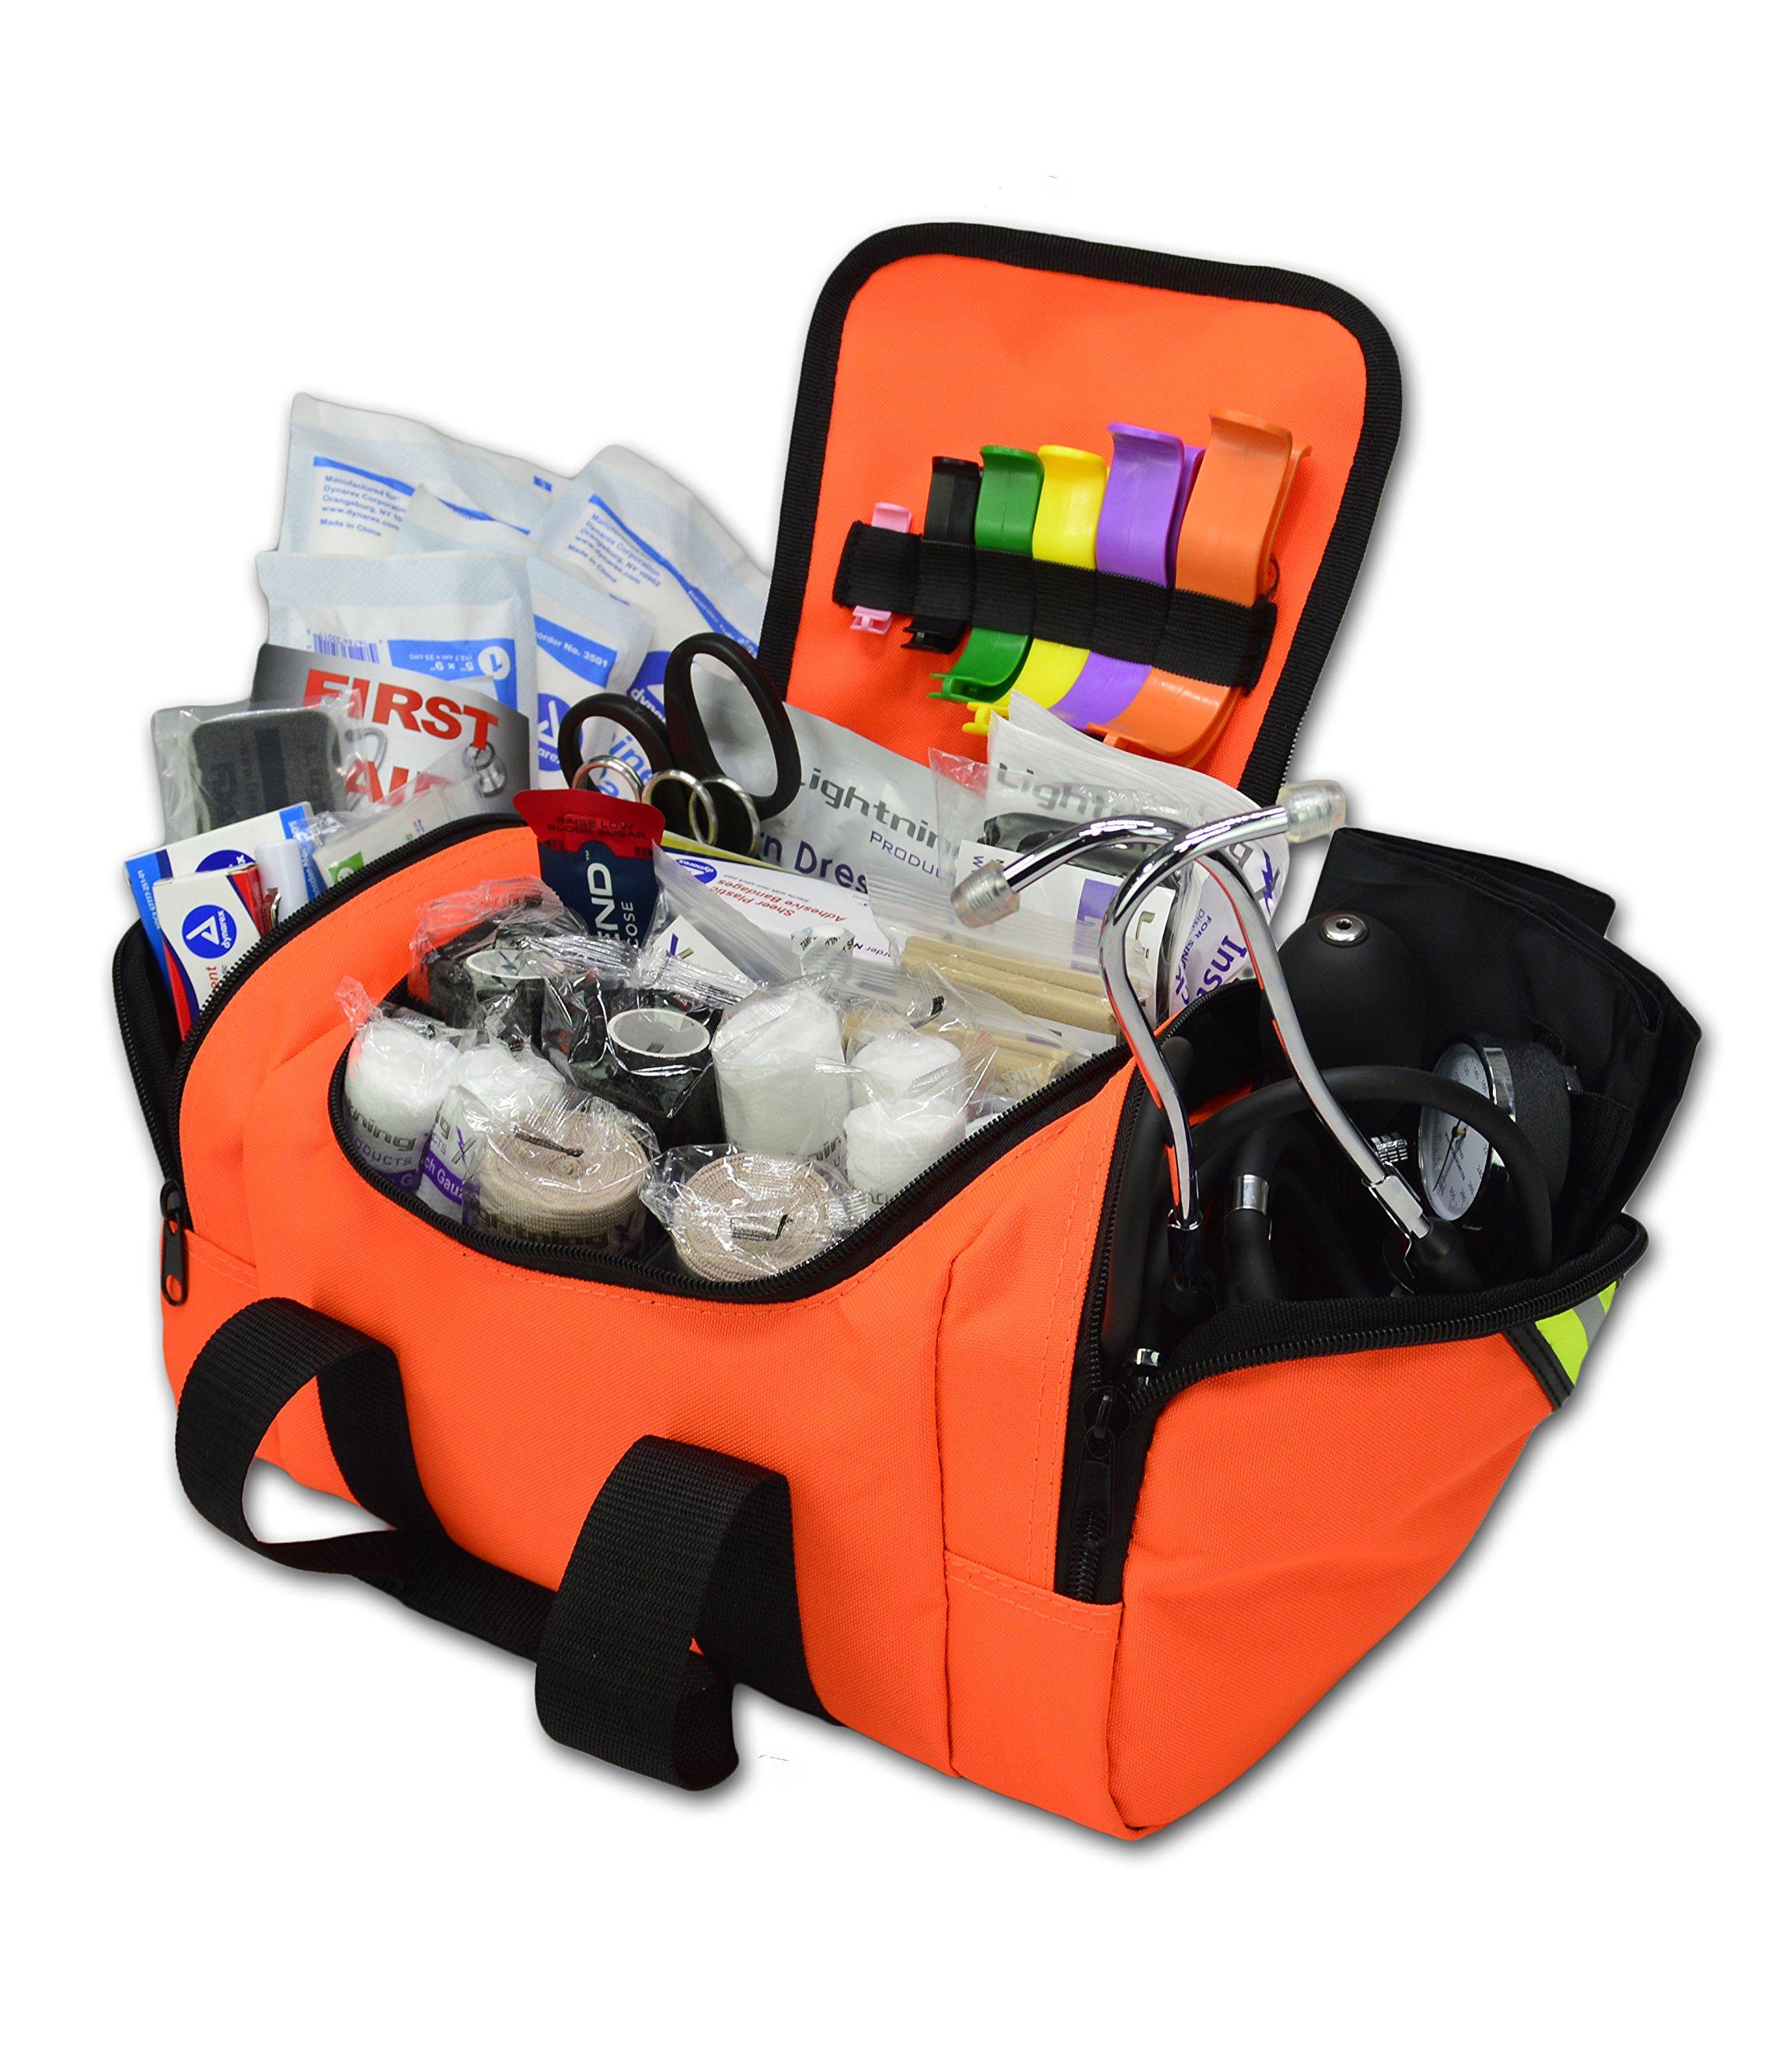 Lightning X Value Compact Medic First Responder EMS/EMT Stocked Trauma Bag w/Standard Fill Kit B - Orange by Lightning X Products (Image #1)